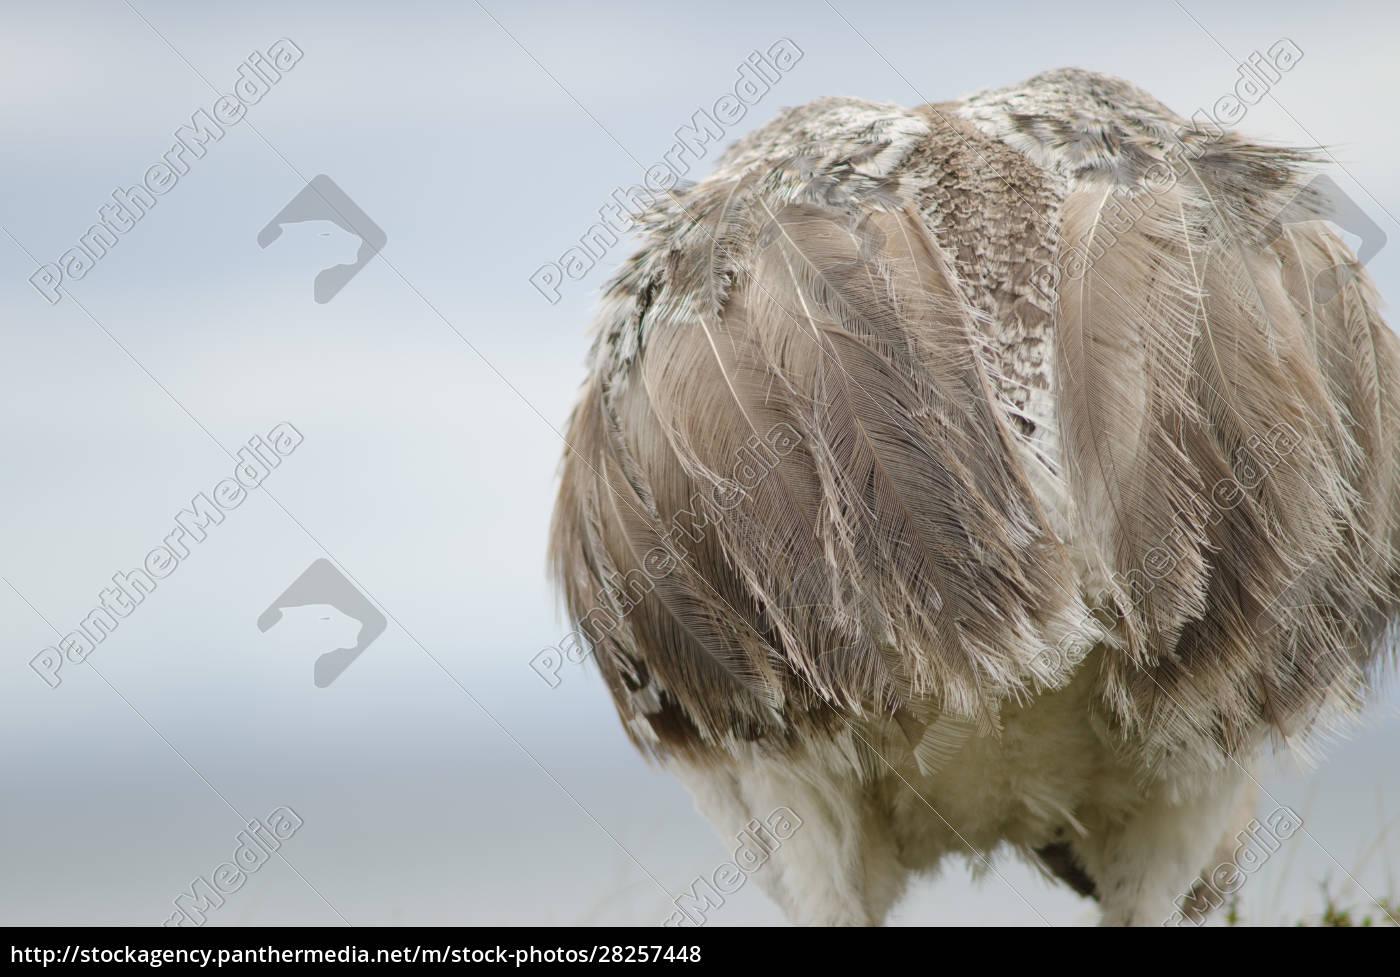 back, view, of, a, darwin's, rhea - 28257448